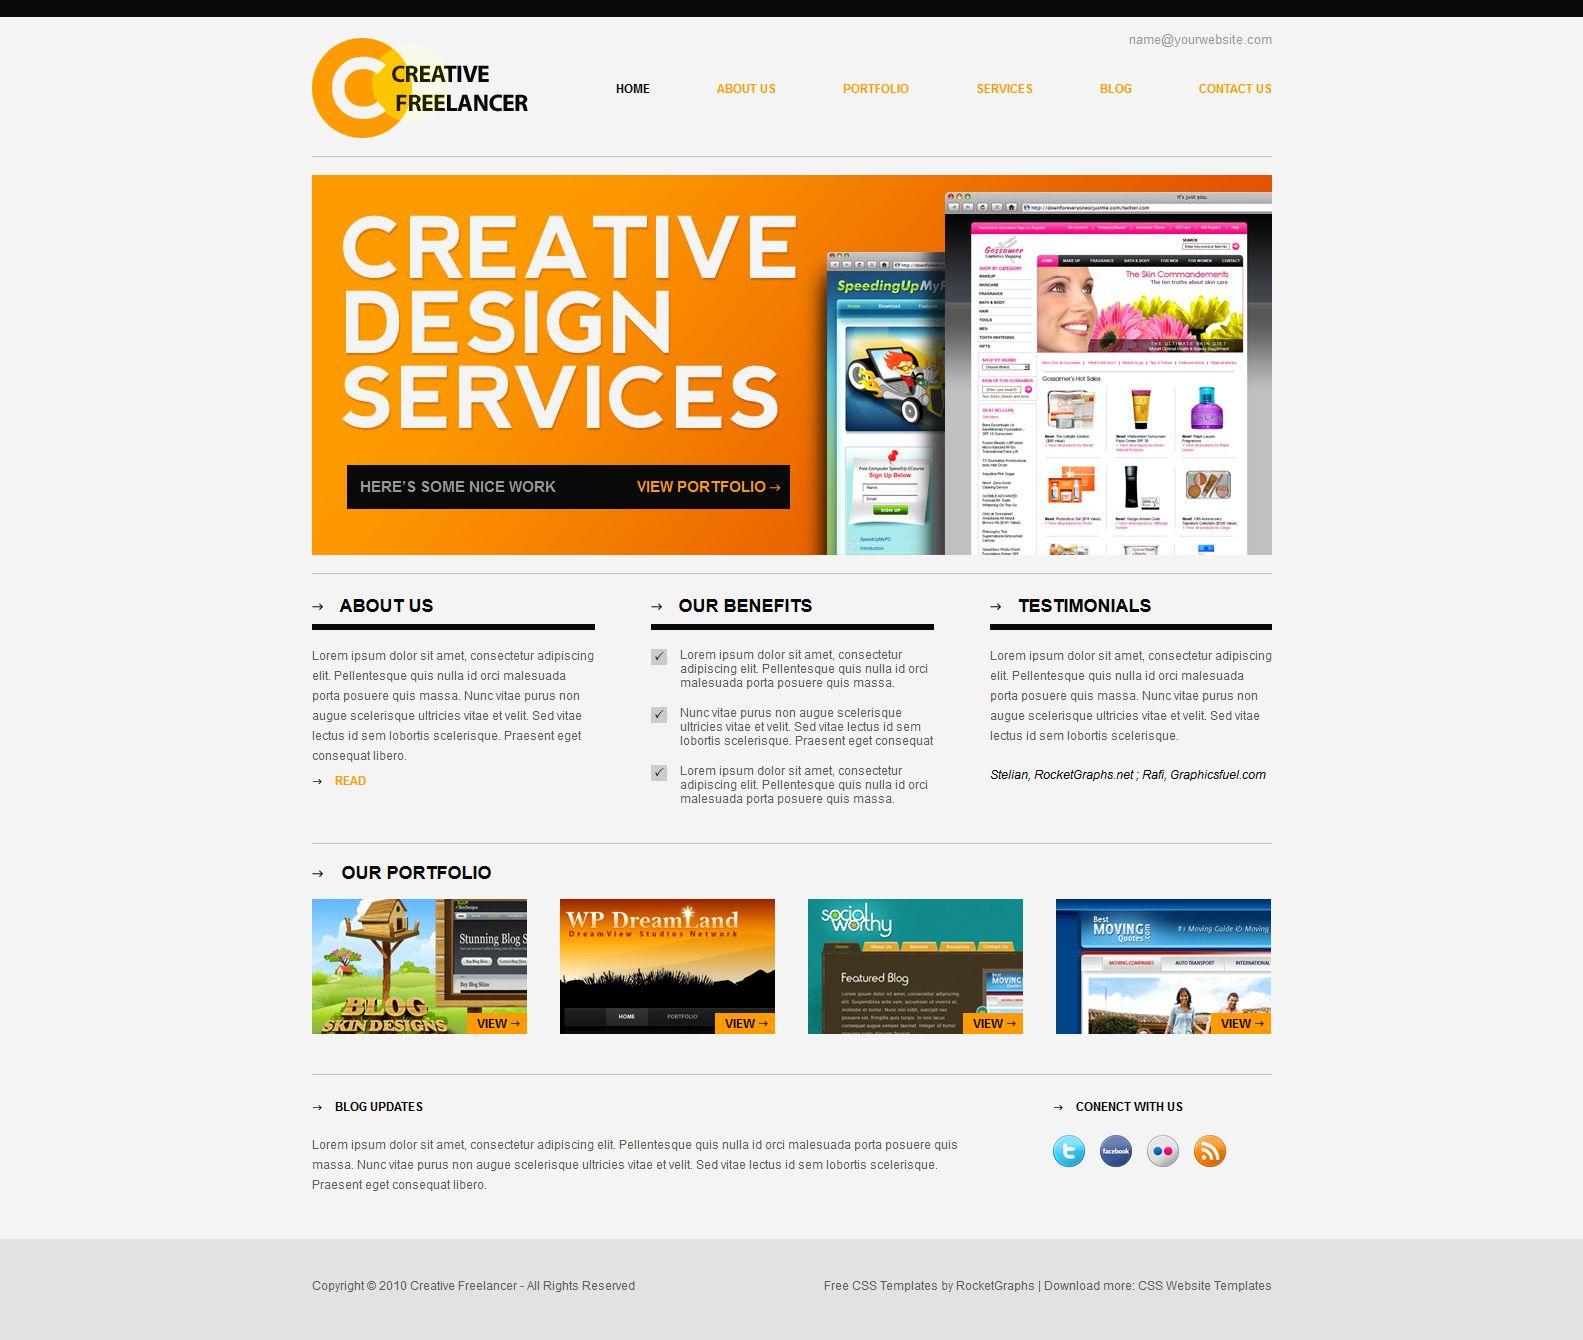 Creative Freelancer